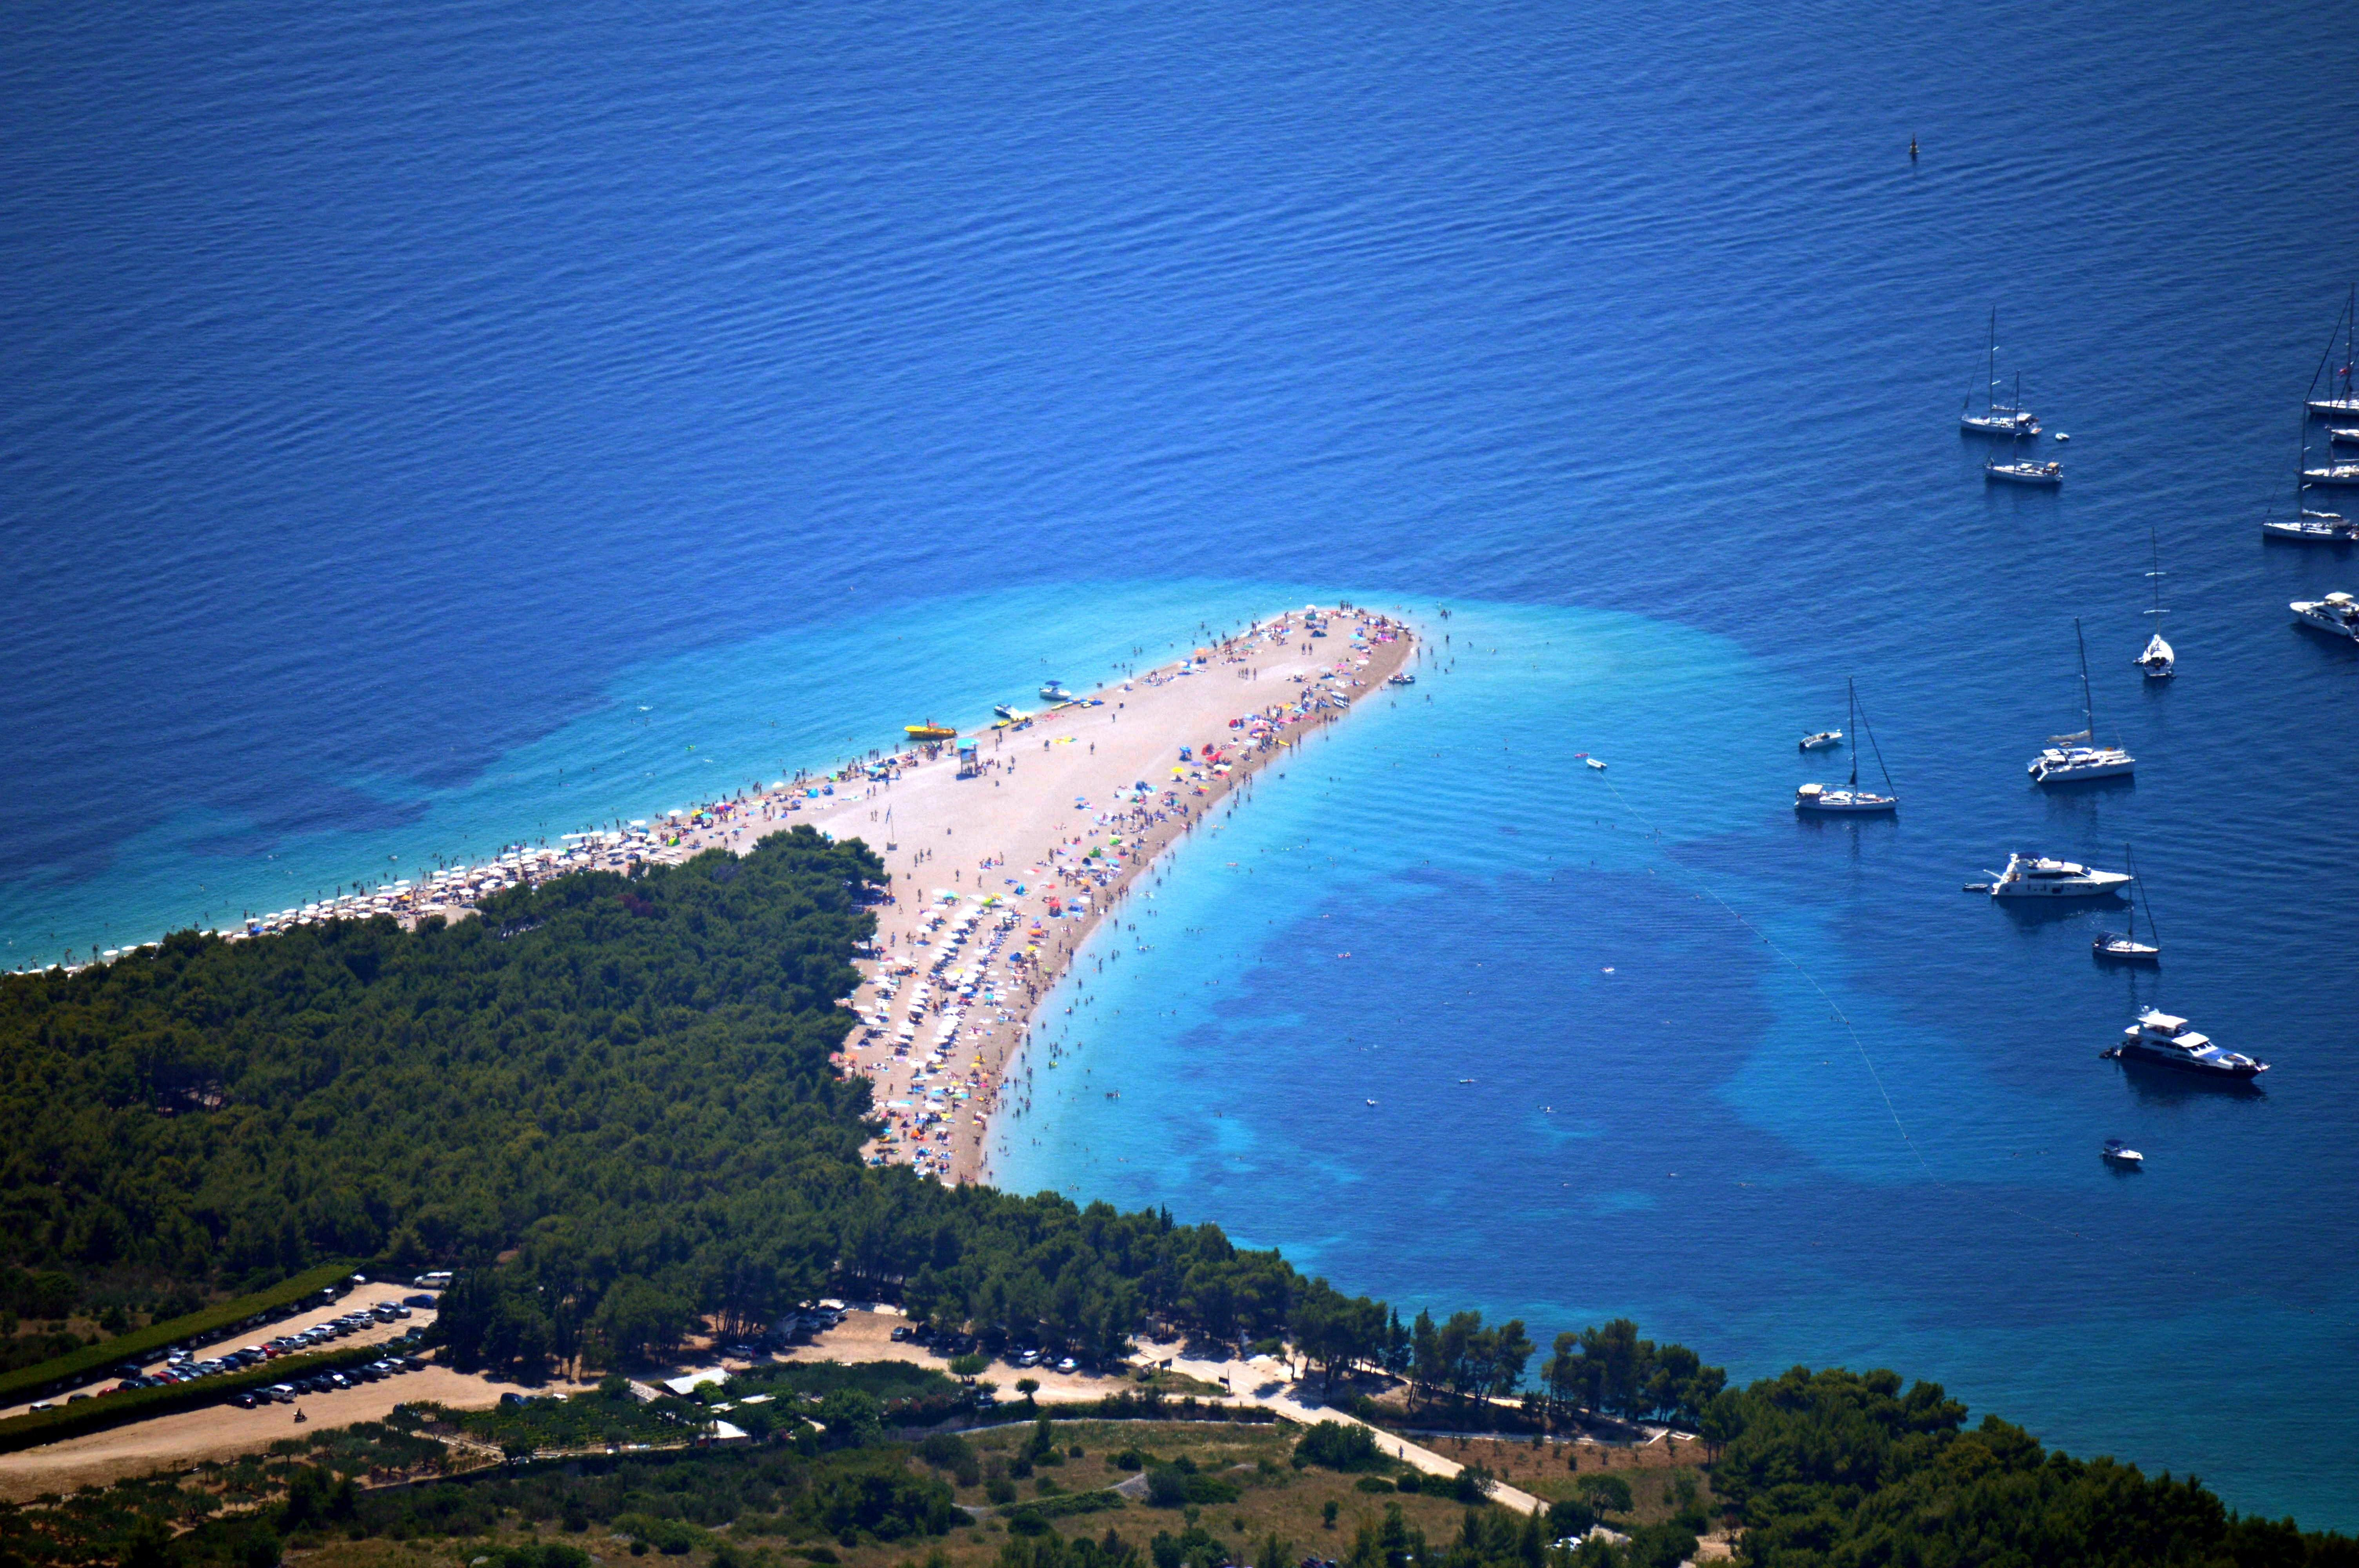 Дикие пляжи хорватии фото